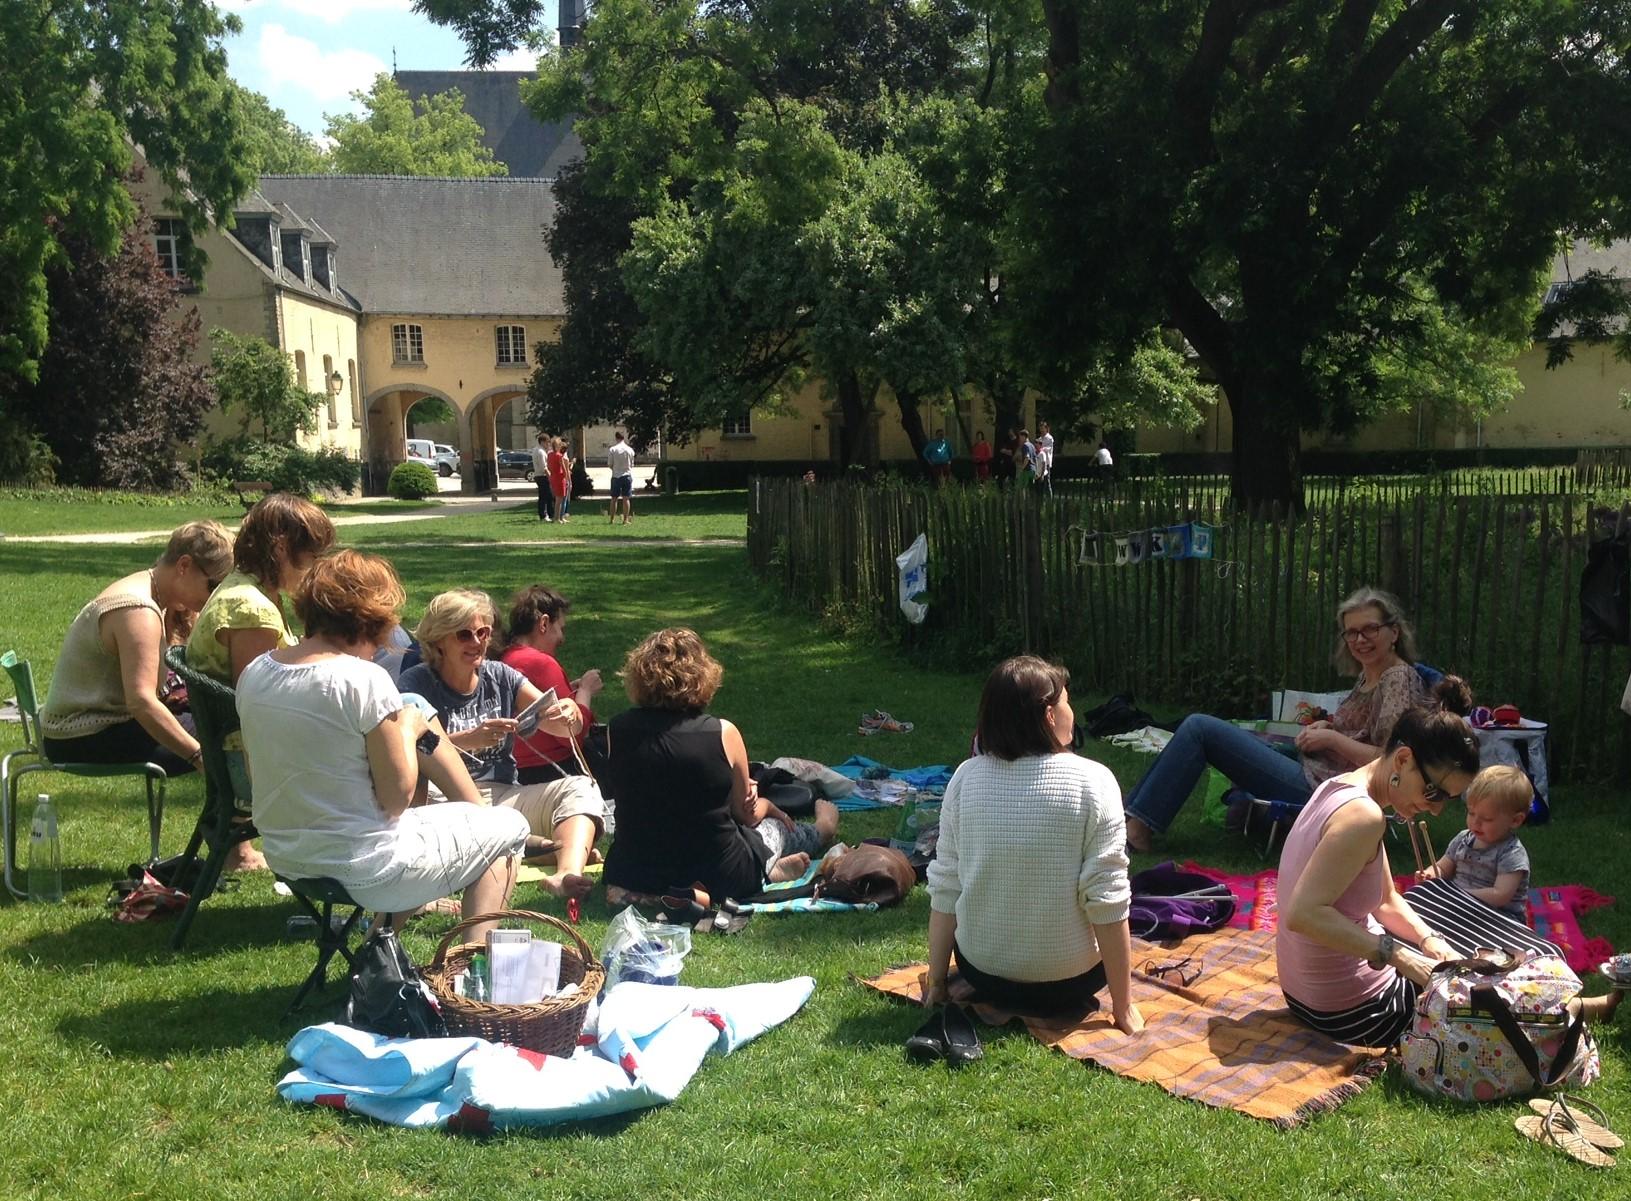 WWKIP group in park 1.JPG